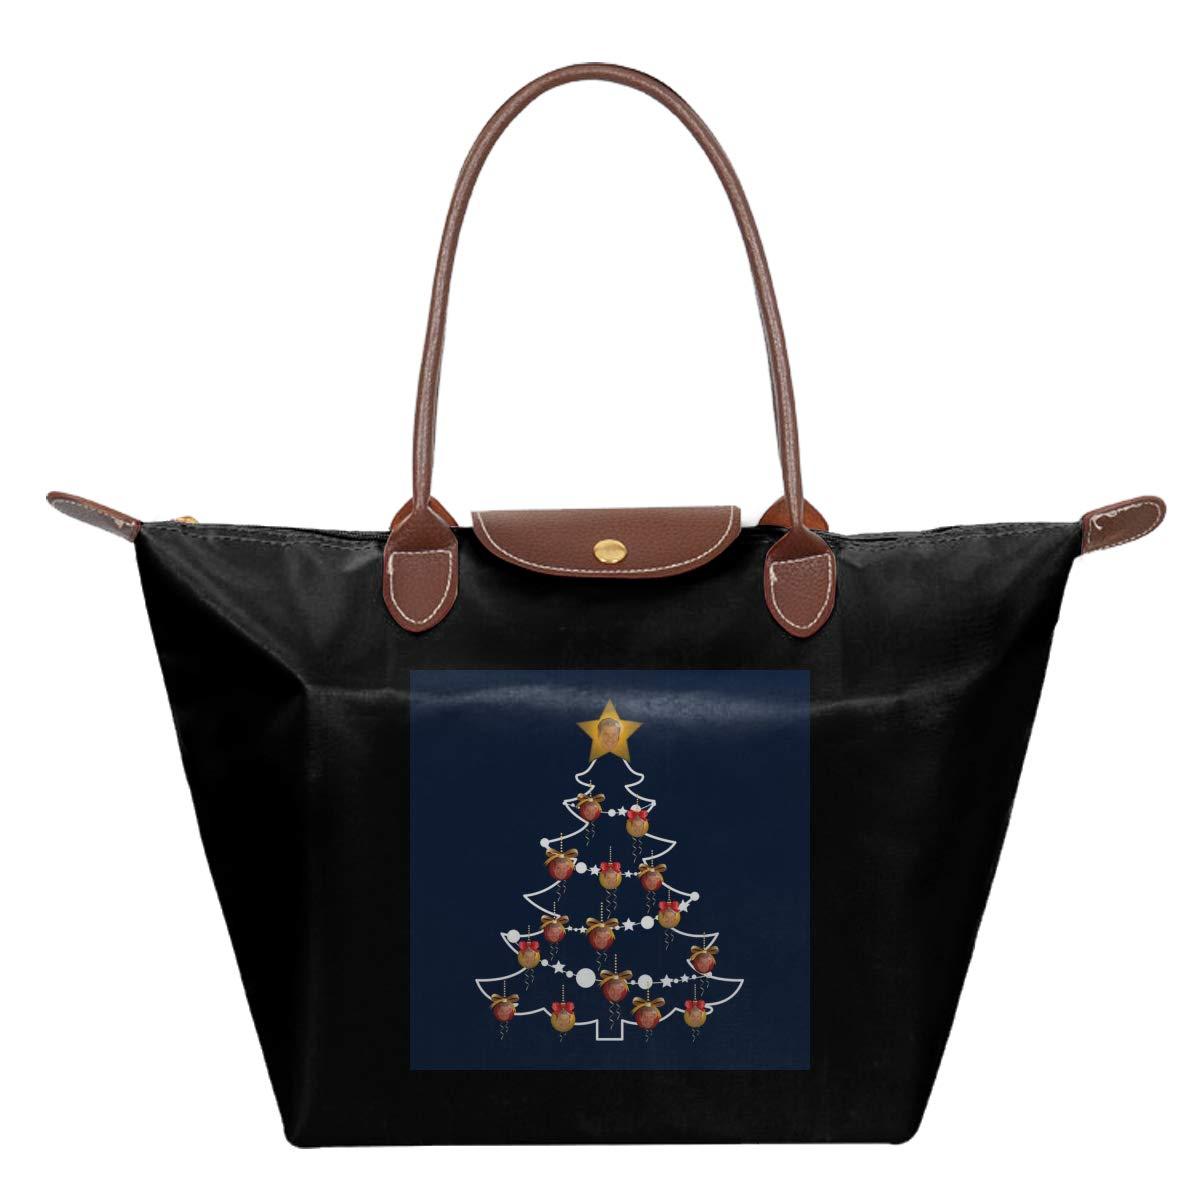 David Hasselhoff Christmas Tree Baubles Waterproof Leather Folded Messenger Nylon Bag Travel Tote Hopping Folding School Handbags